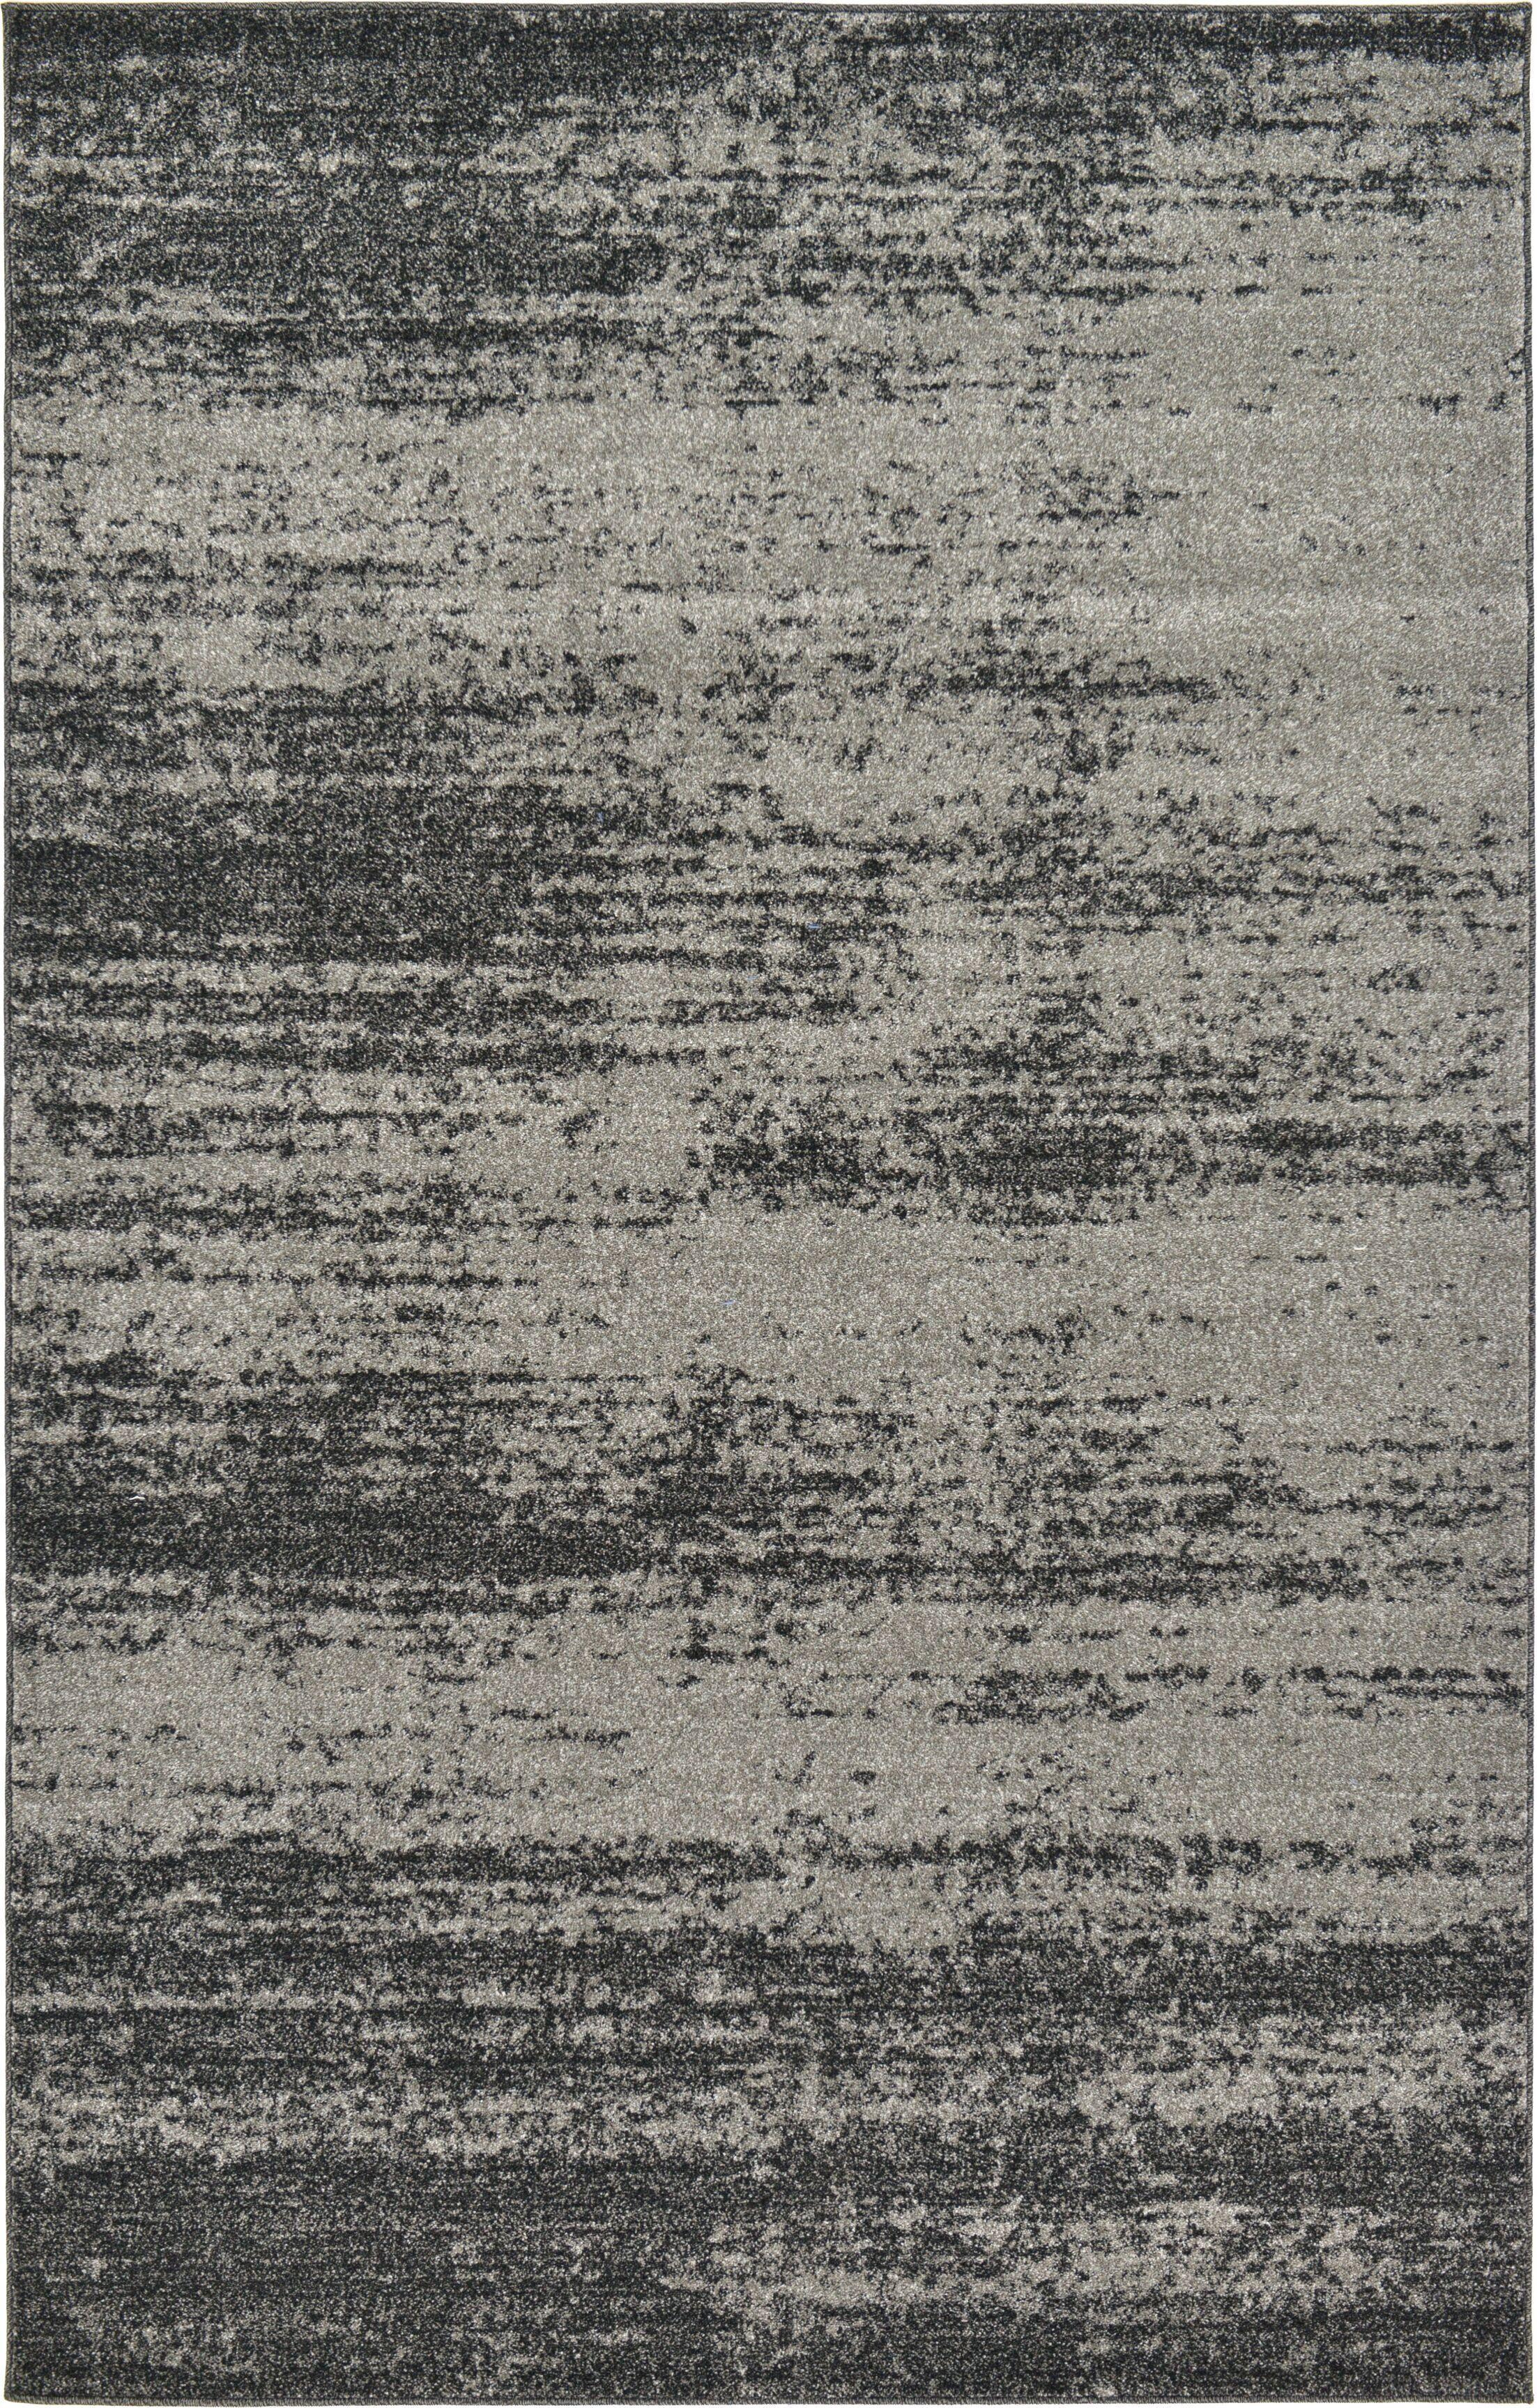 Croslin Gray Area Rug Rug Size: Rectangle 5' x 8'